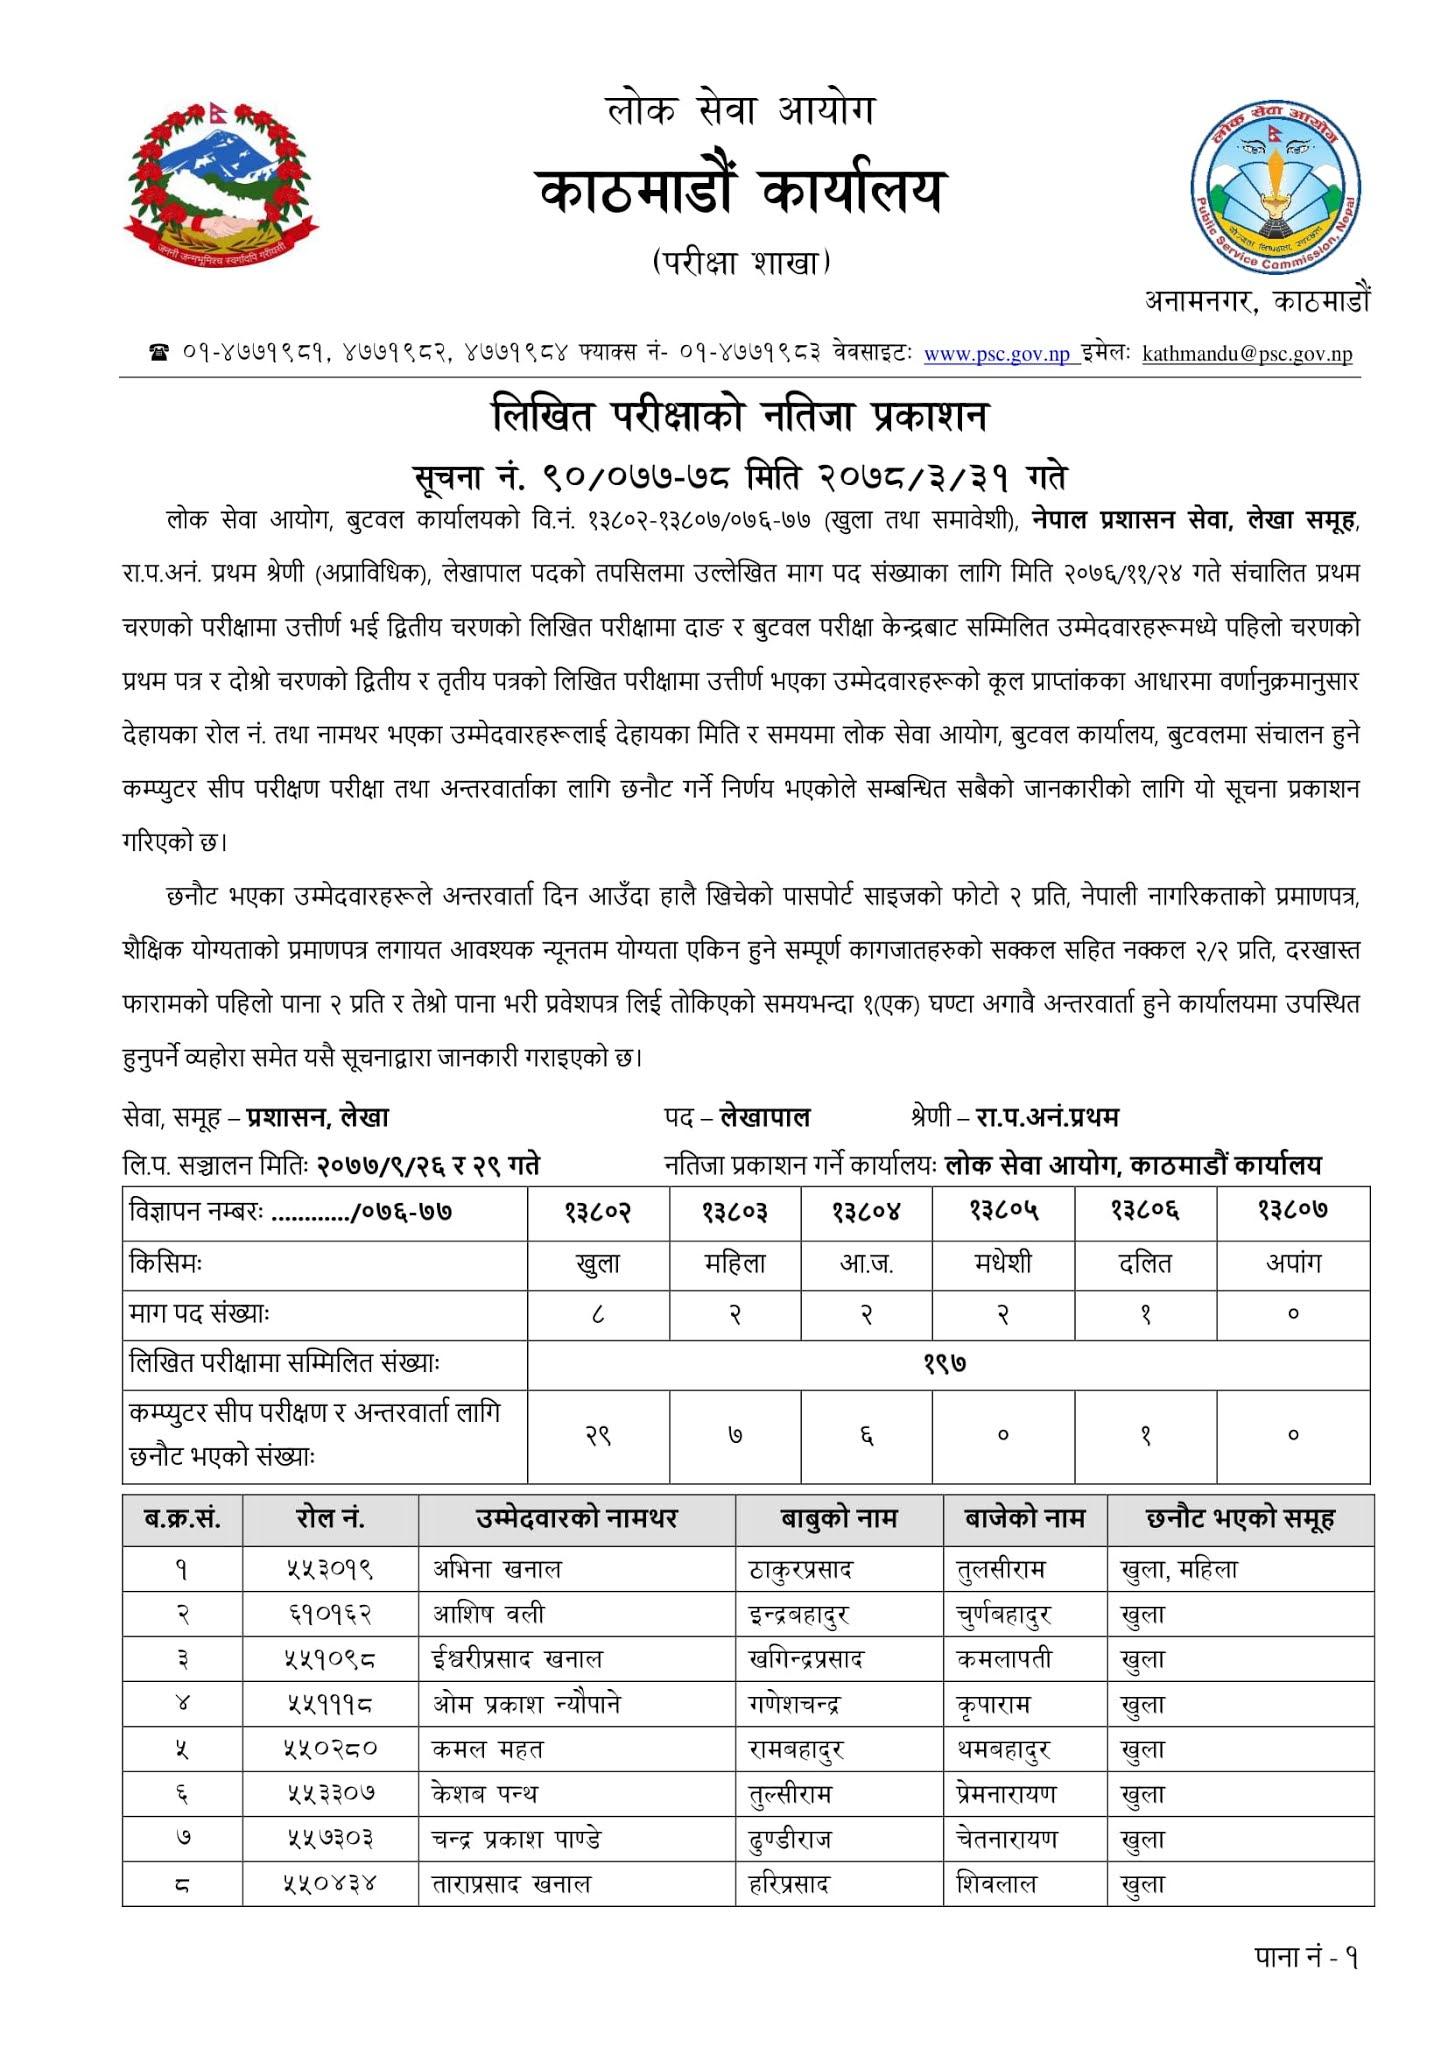 NASU Account - Butwal Lok Sewa Aayog Written Exam Result & Exam Schedule